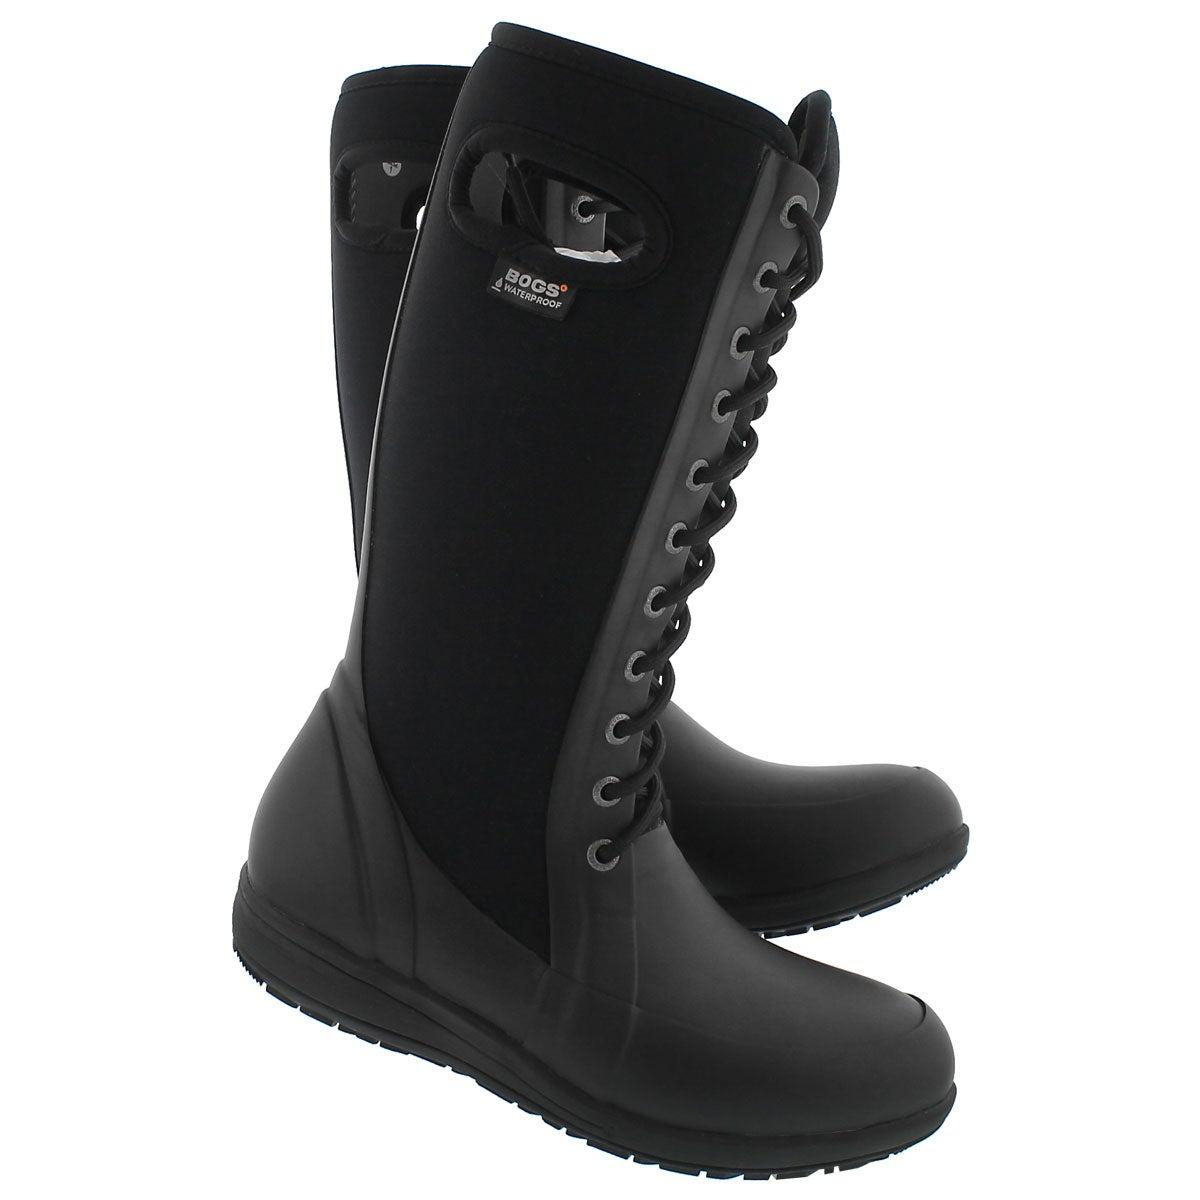 Lds Cami LaceTall black wtpf boot